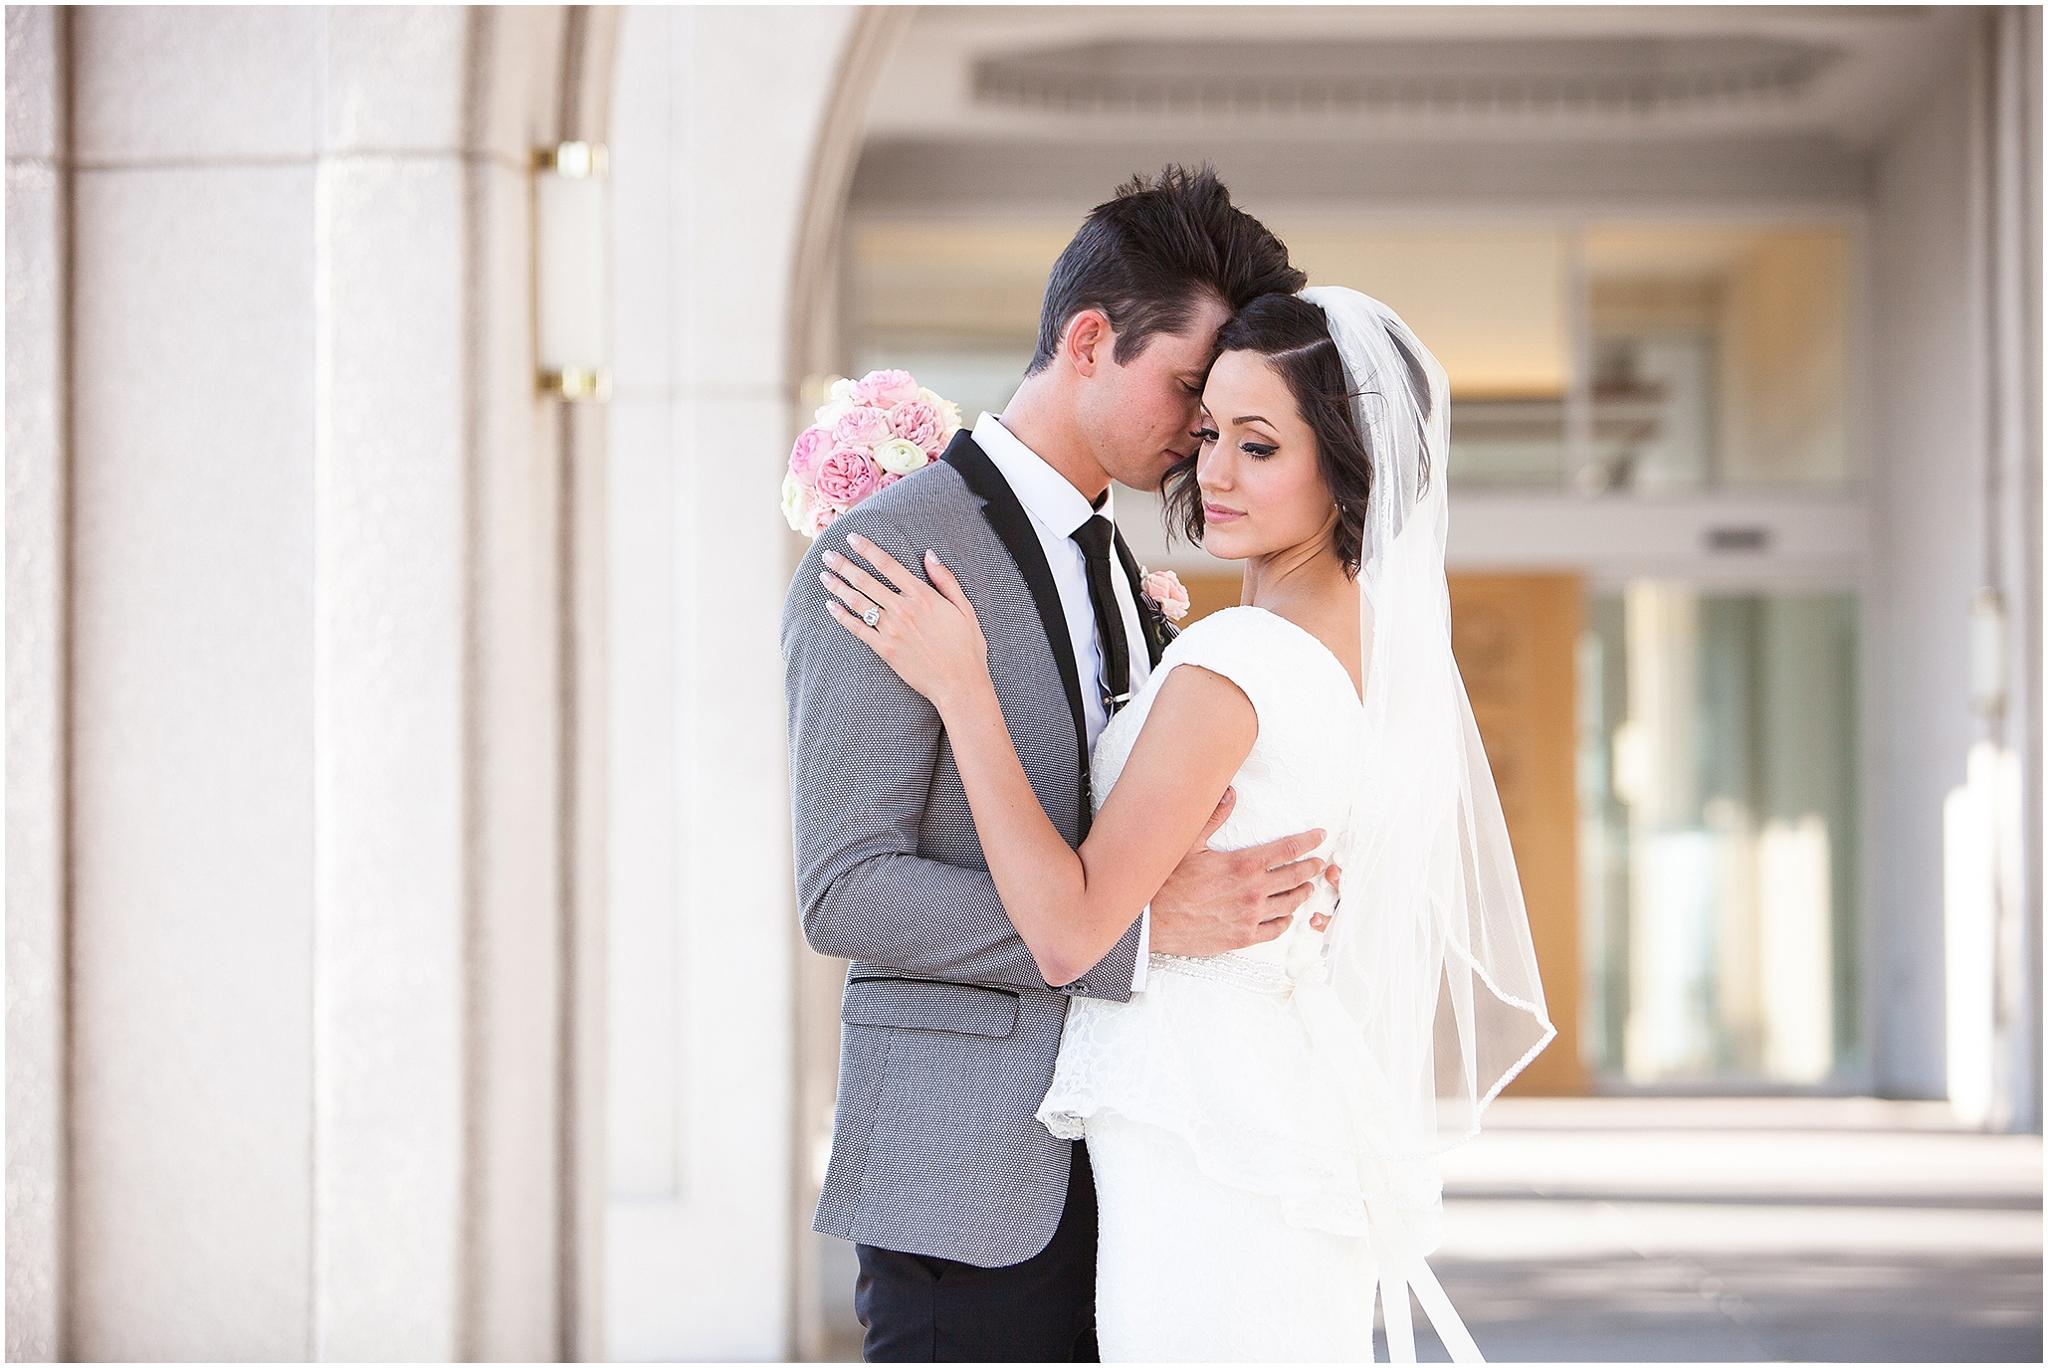 IMG_0037-Edit-102_Lizzie-B-Imagery-Utah-Wedding-Photographer-Salt-Lake-City-Park-City-timpanogos-Utah-Temple.jpg